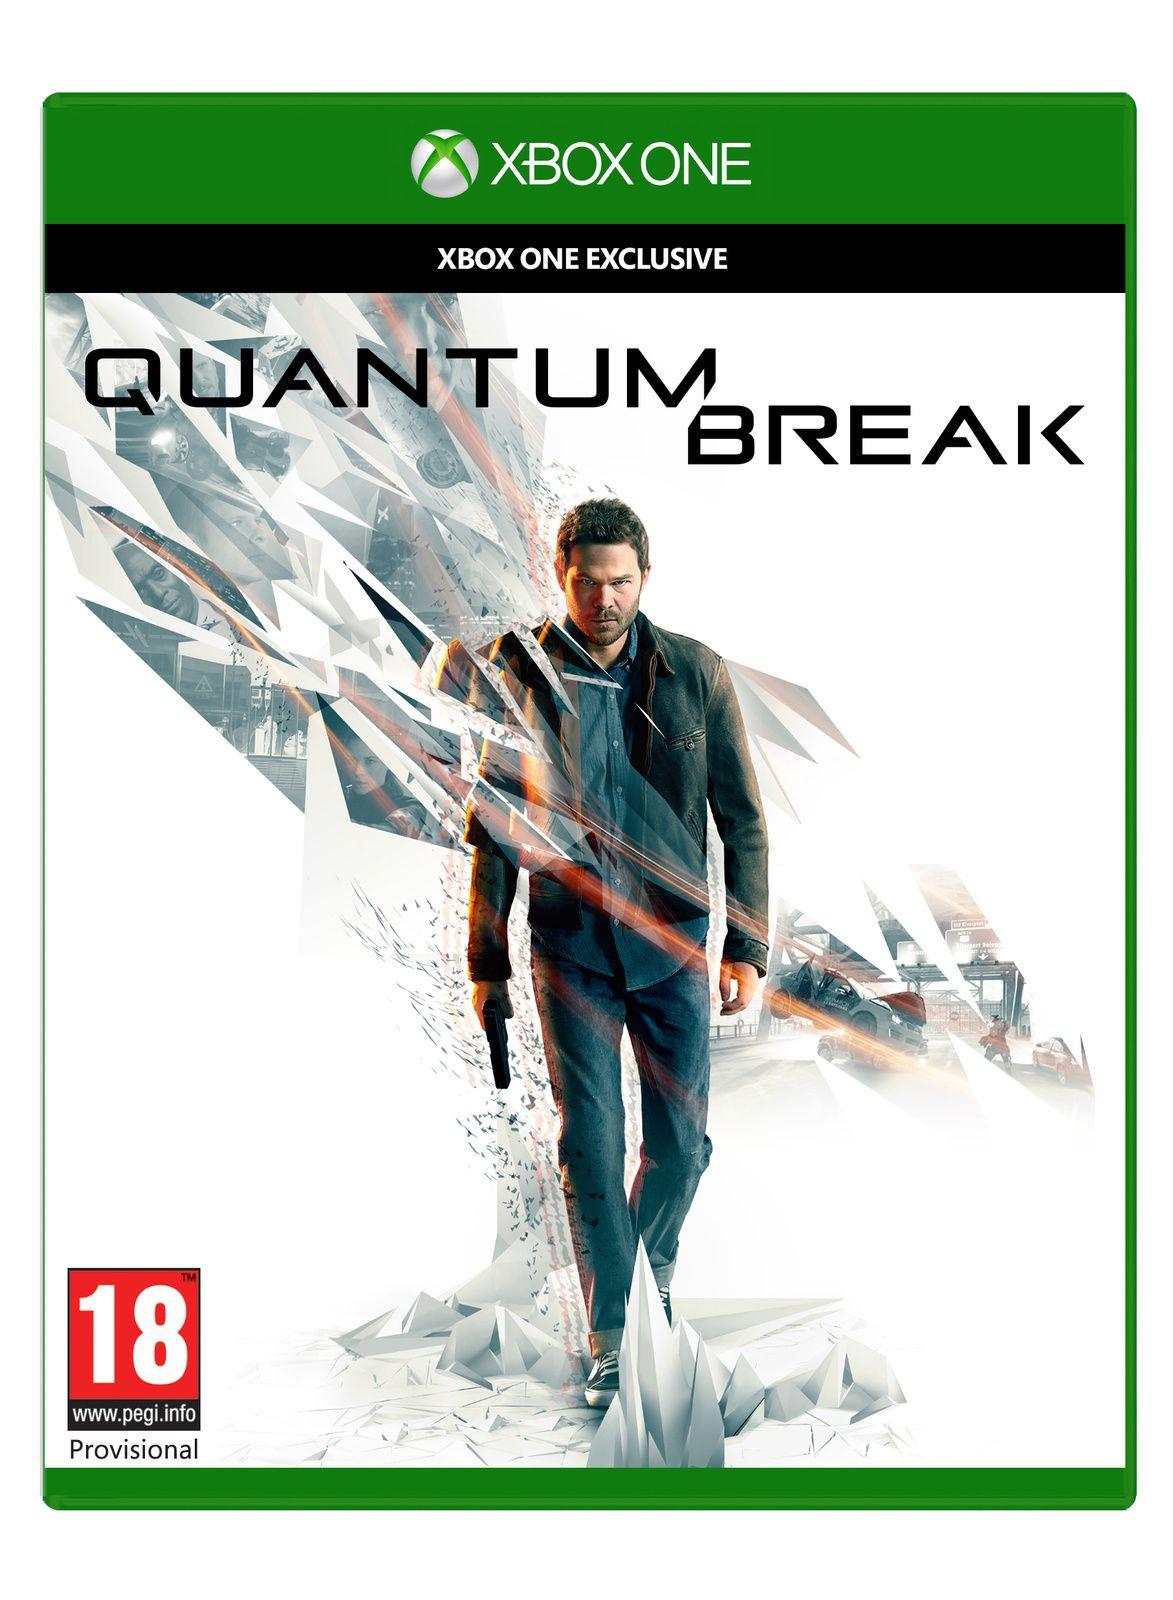 Quantum Break - nouveau trailer The Games Awards 2015 - Exclu #XboxOne #Remady